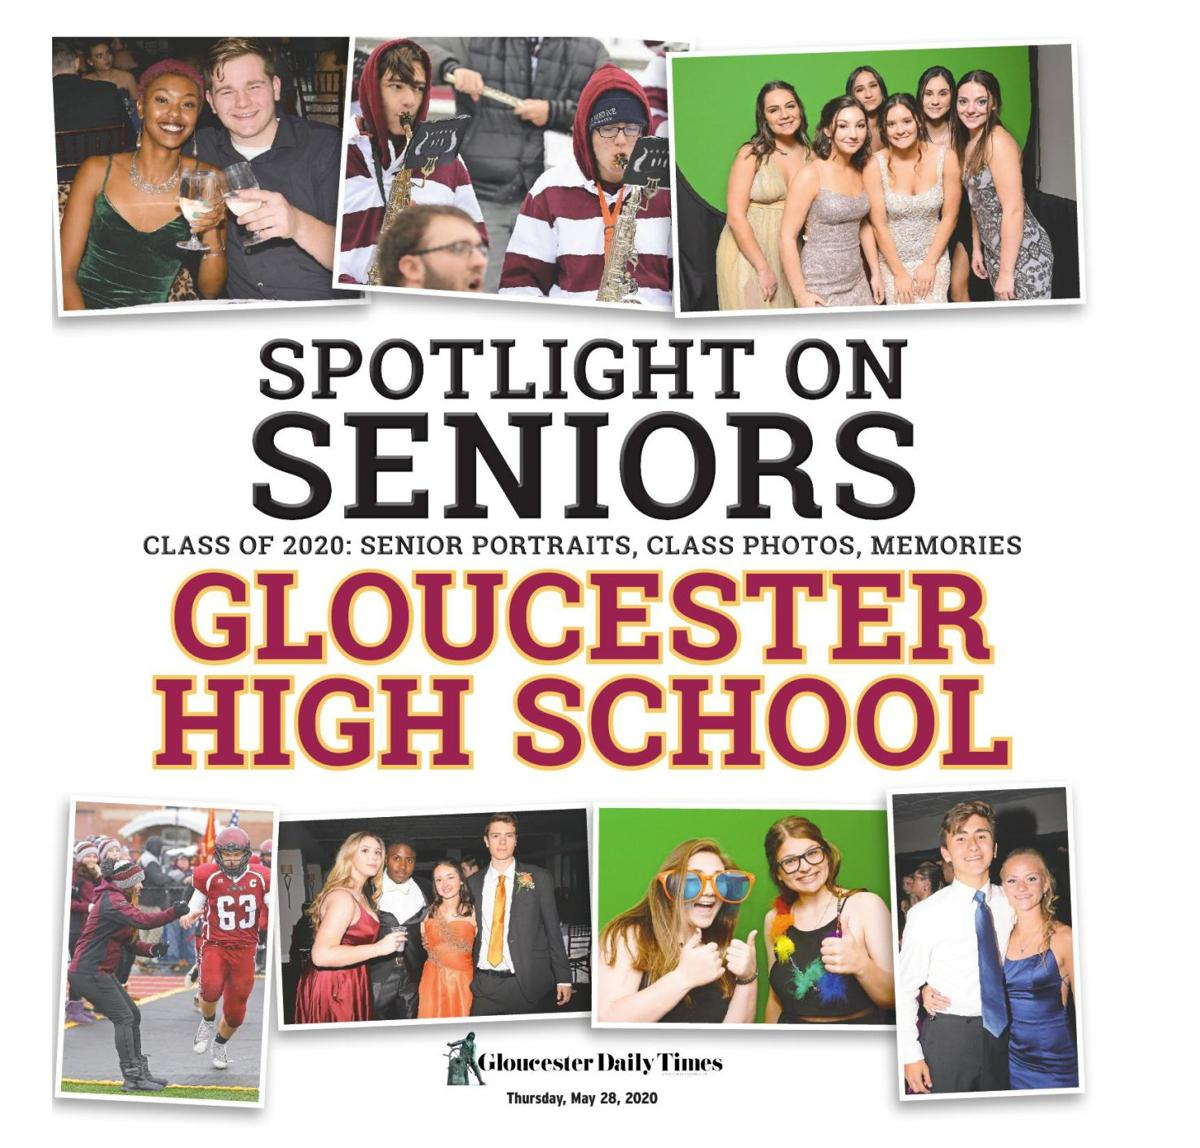 Spotlight on Seniors: Gloucester High School